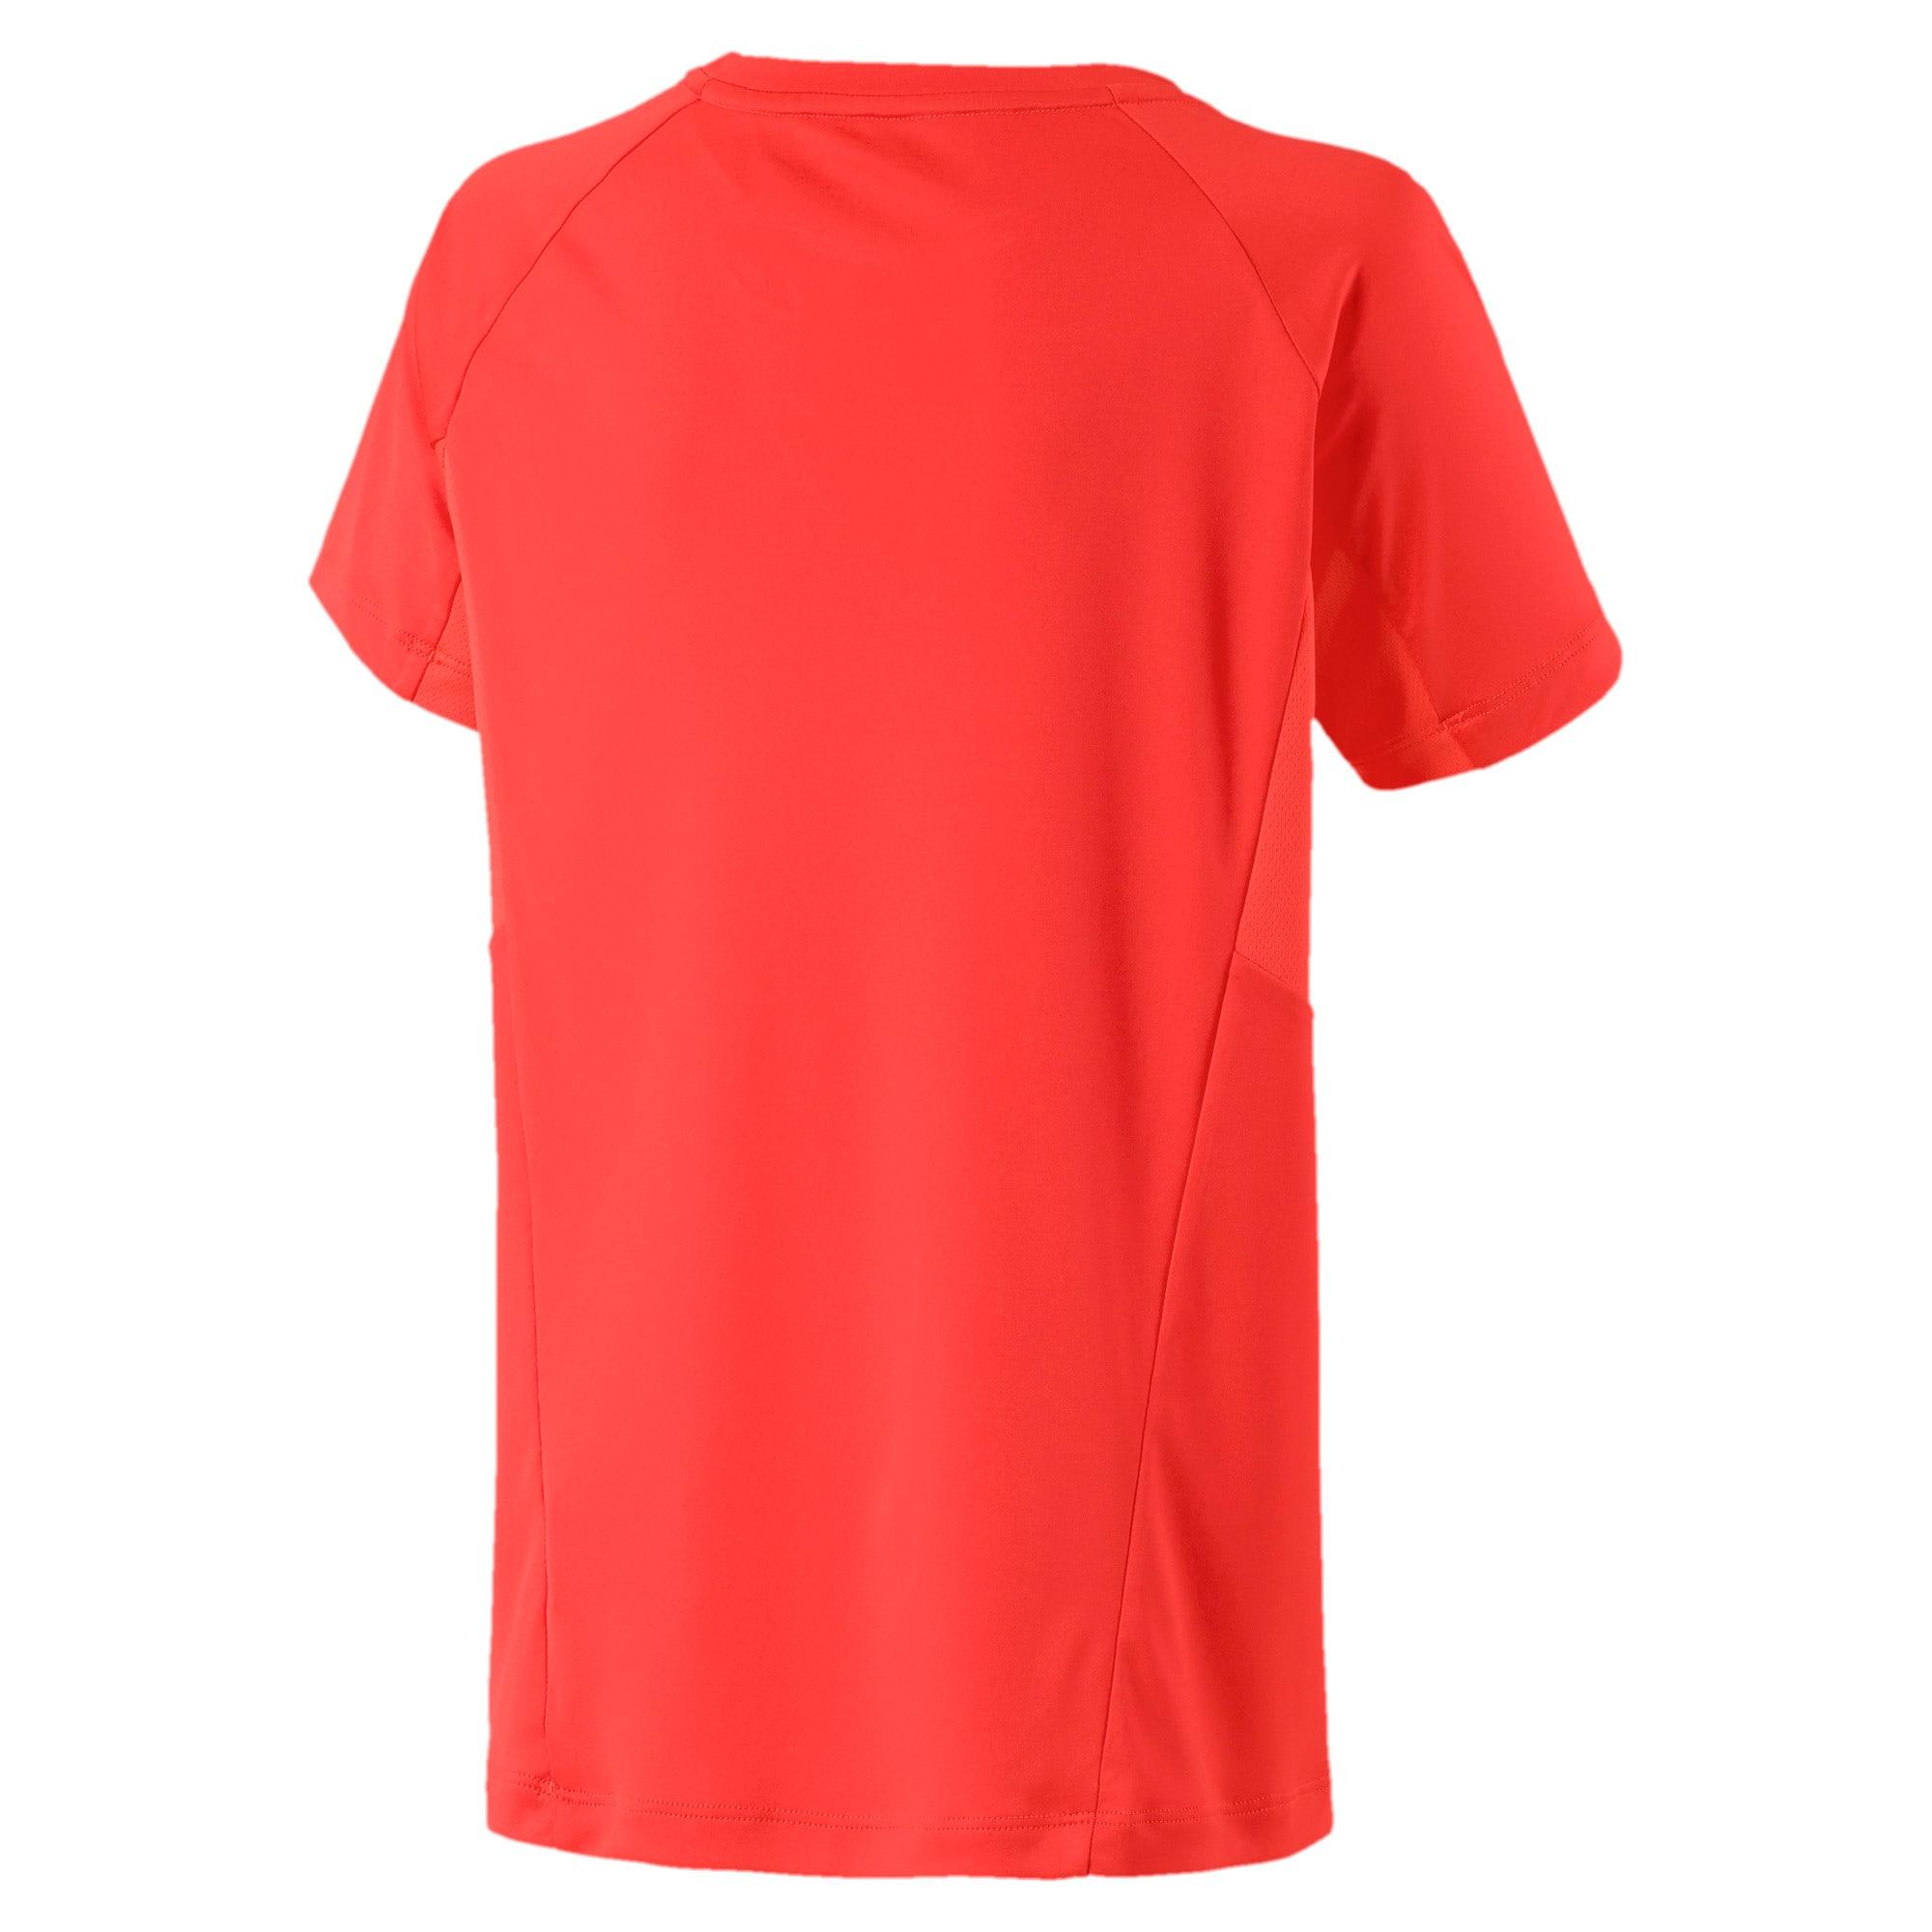 Thumbnail 2 of Active Sports Short Sleeve Boys' Tee, Nrgy Red, medium-IND